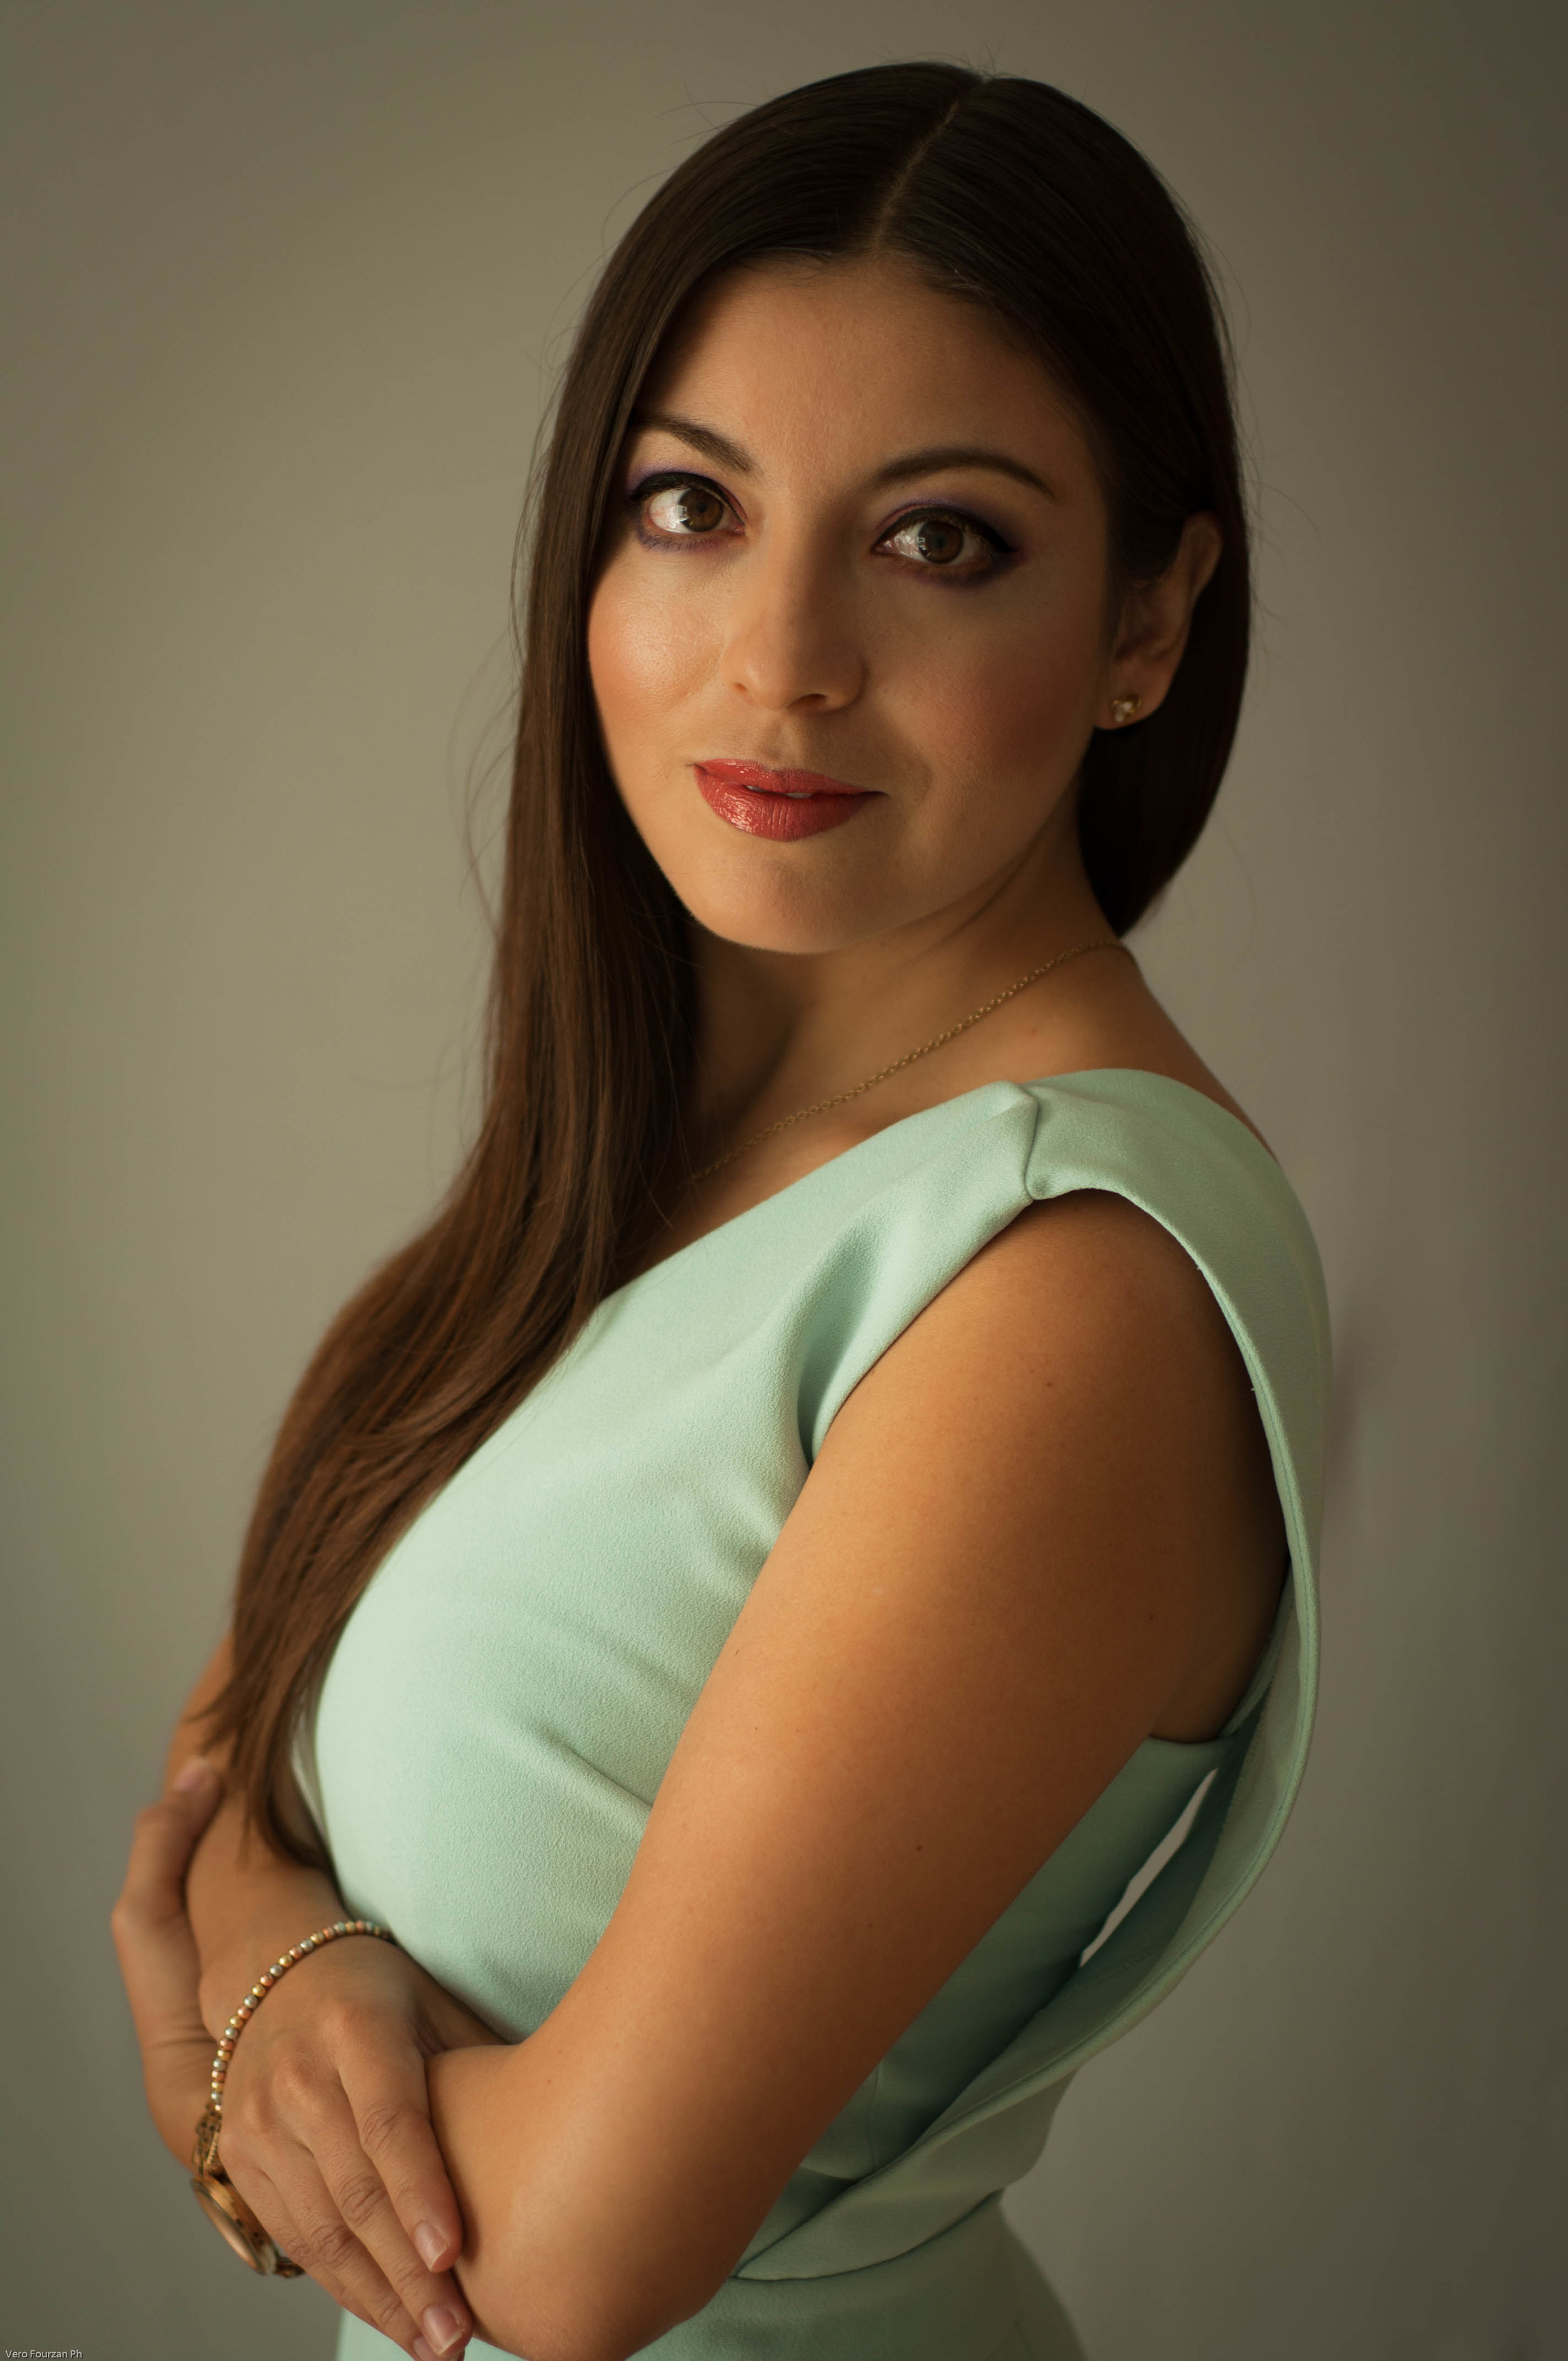 Gina Briseño - Asesor InmobiliarioIdiomas: Españolgina@selvacorealty.com